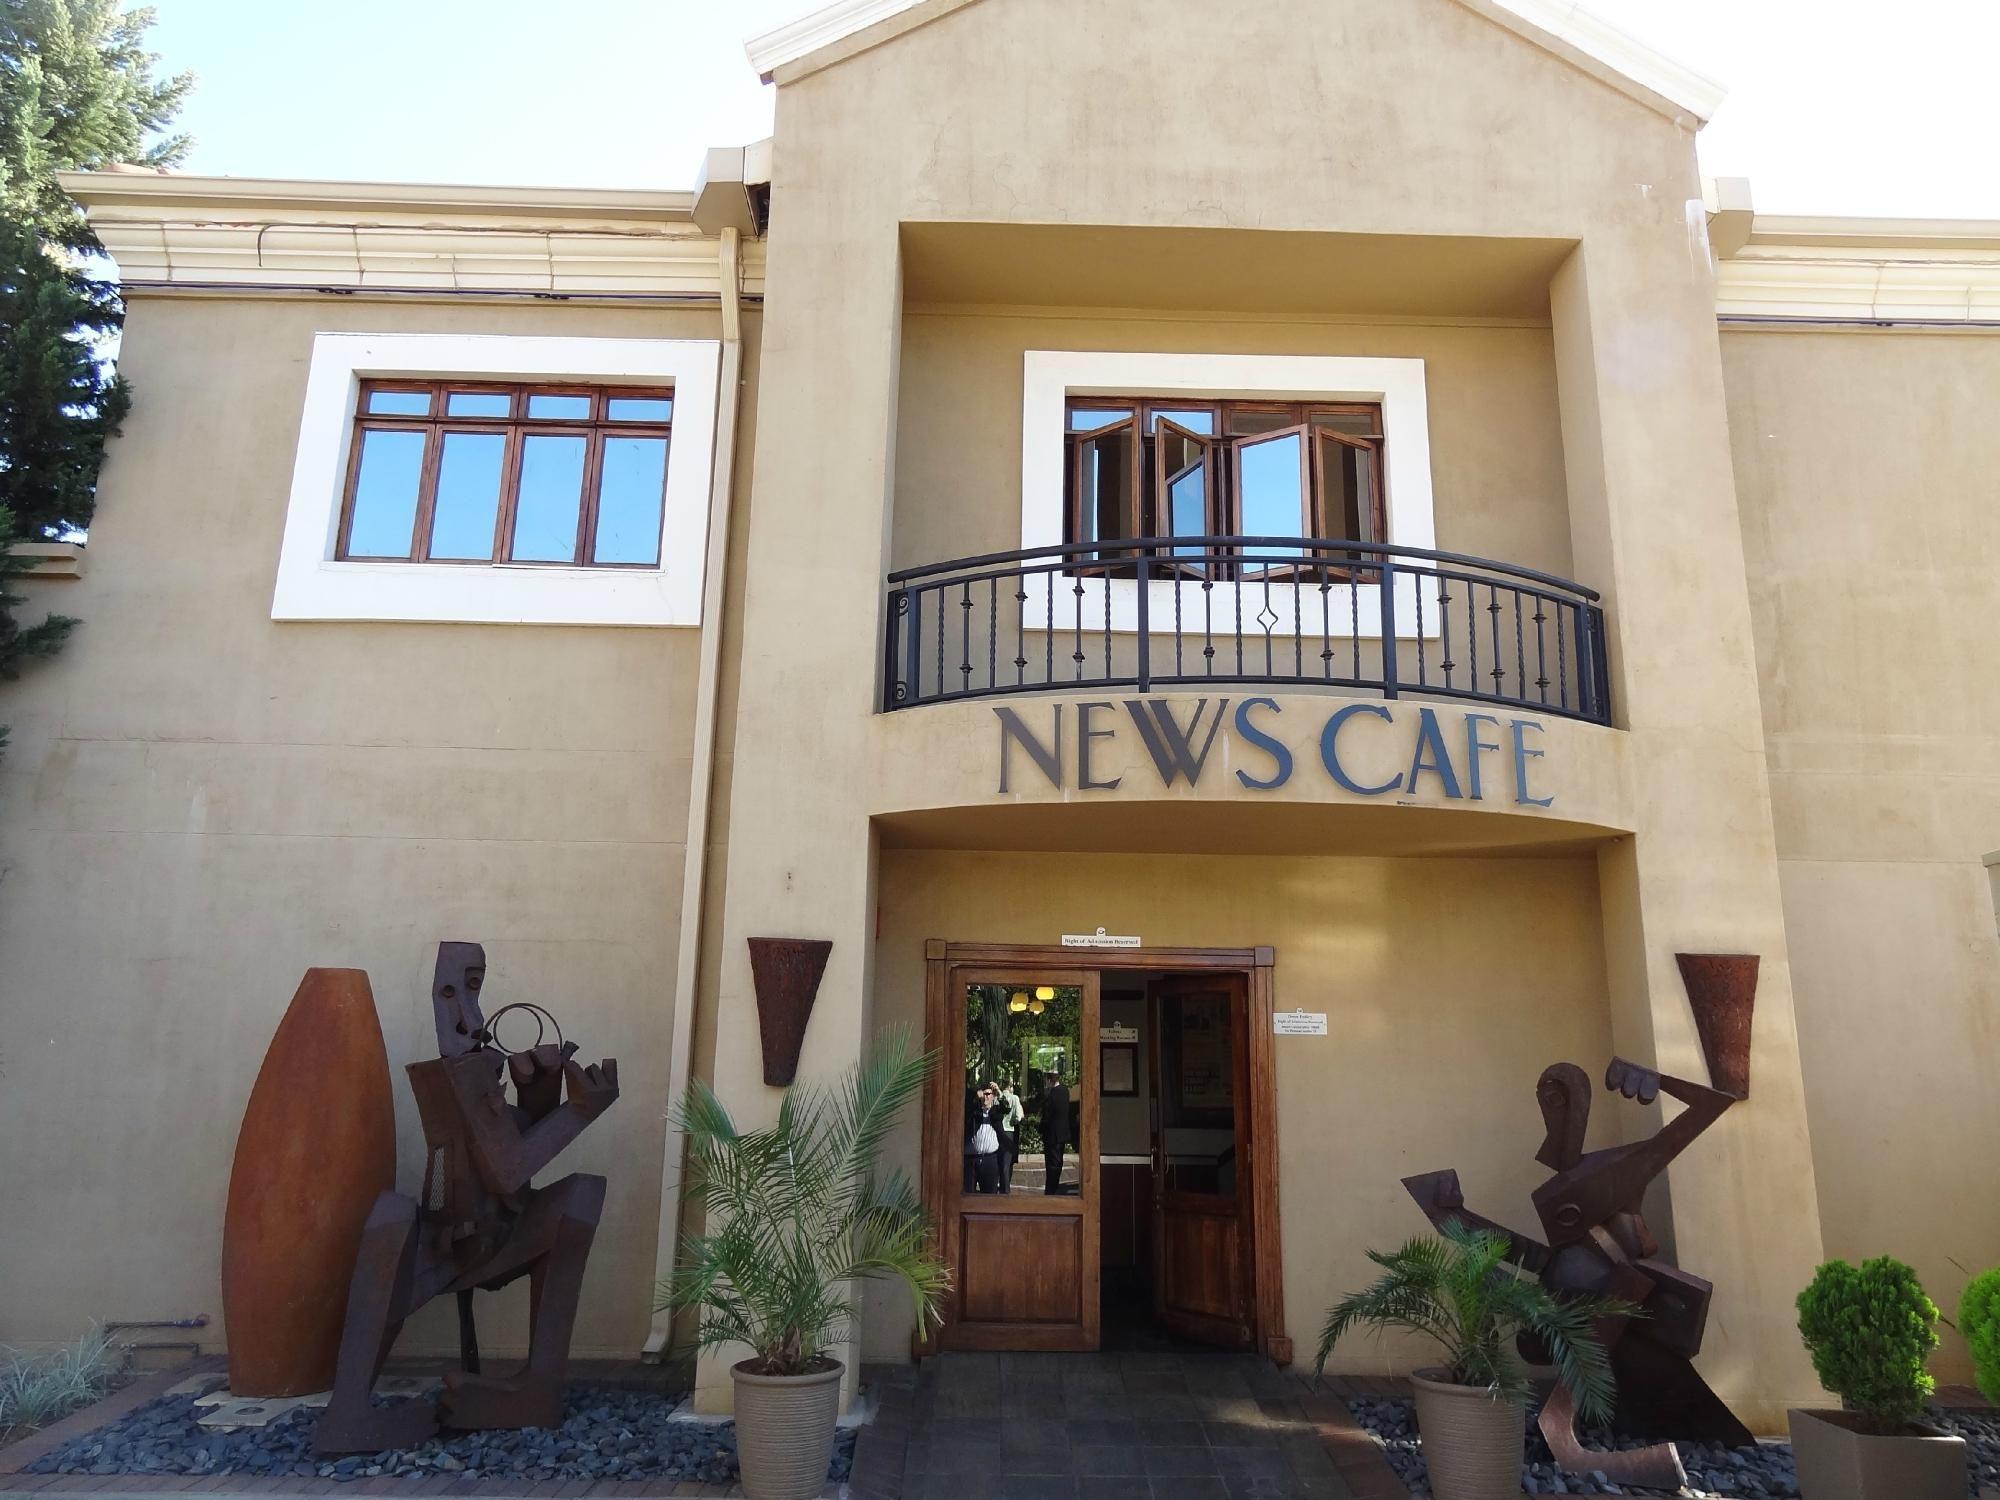 News Cafe, Gaborone Restaurant Reviews, Phone Number